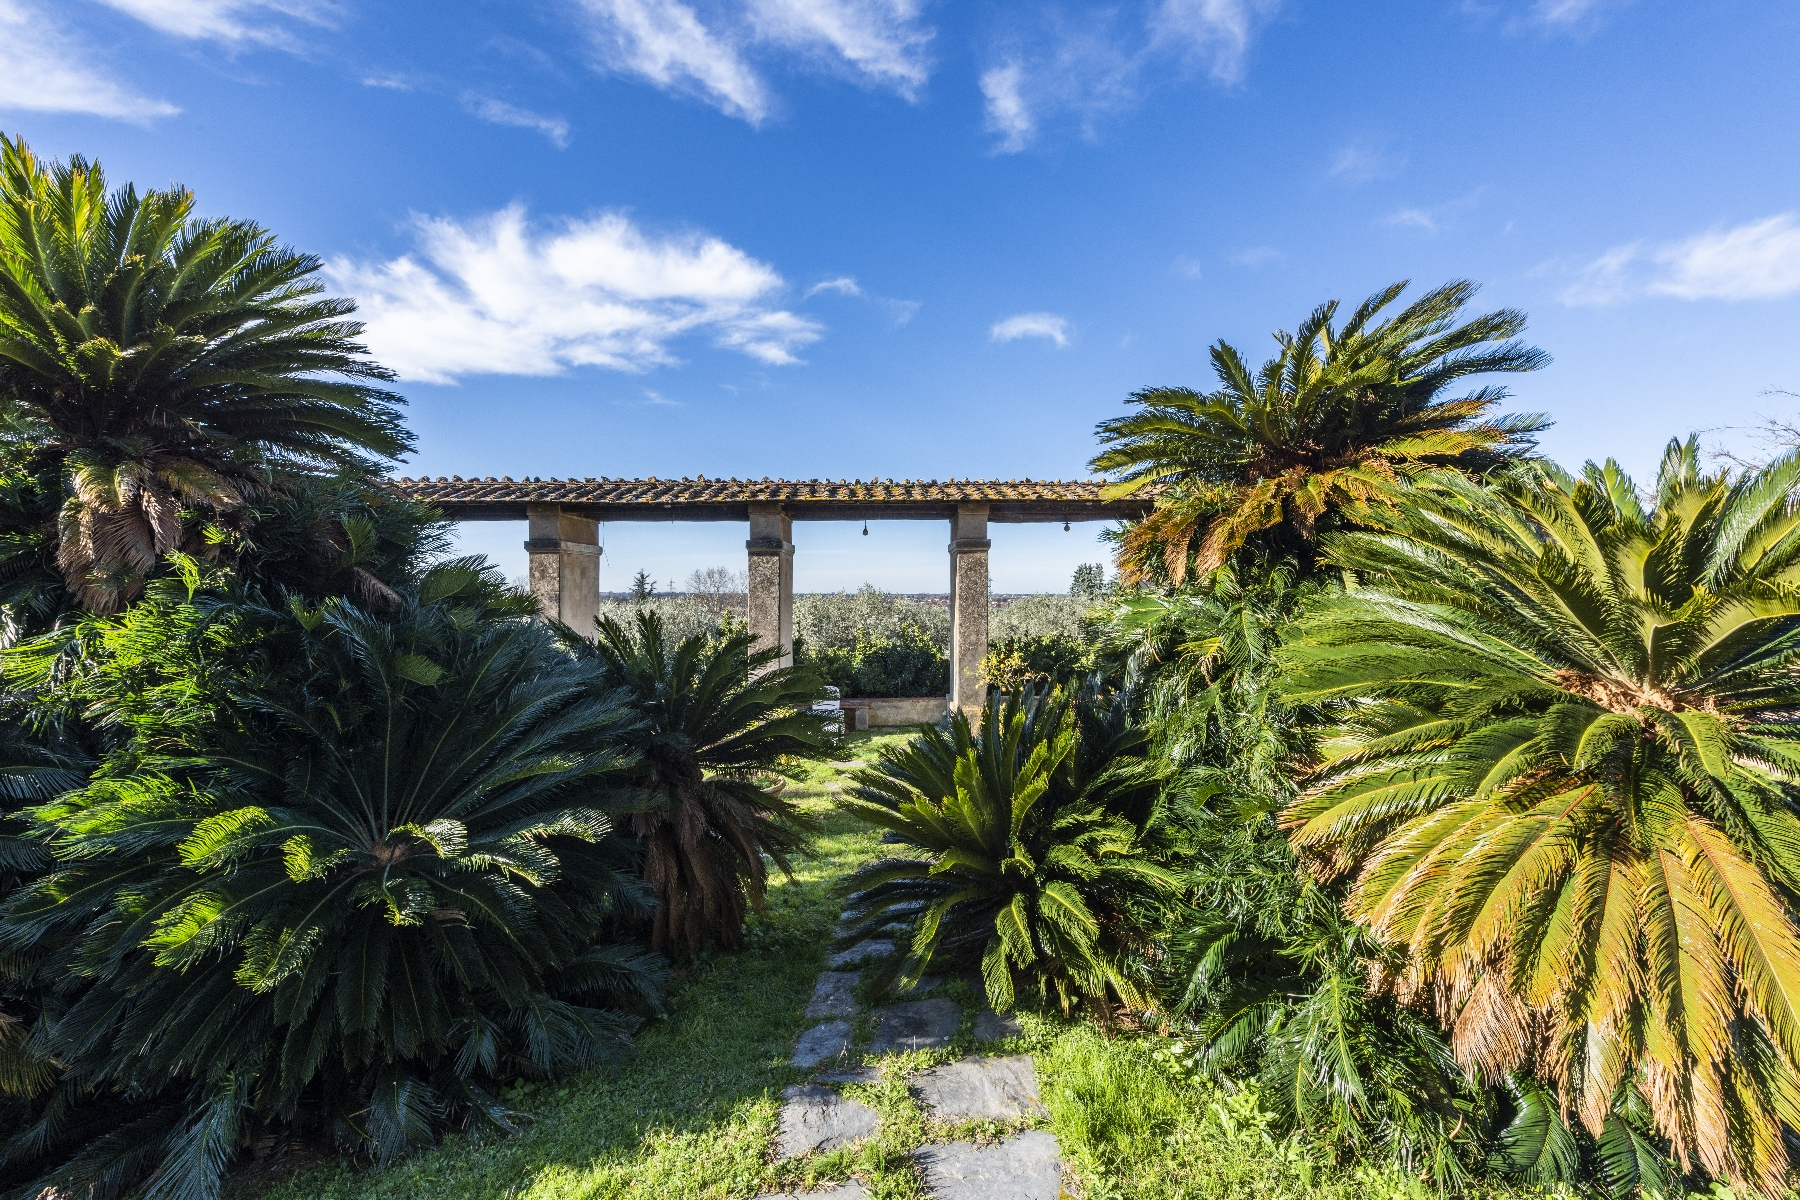 Villa in Vendita a Camaiore: 5 locali, 2800 mq - Foto 25